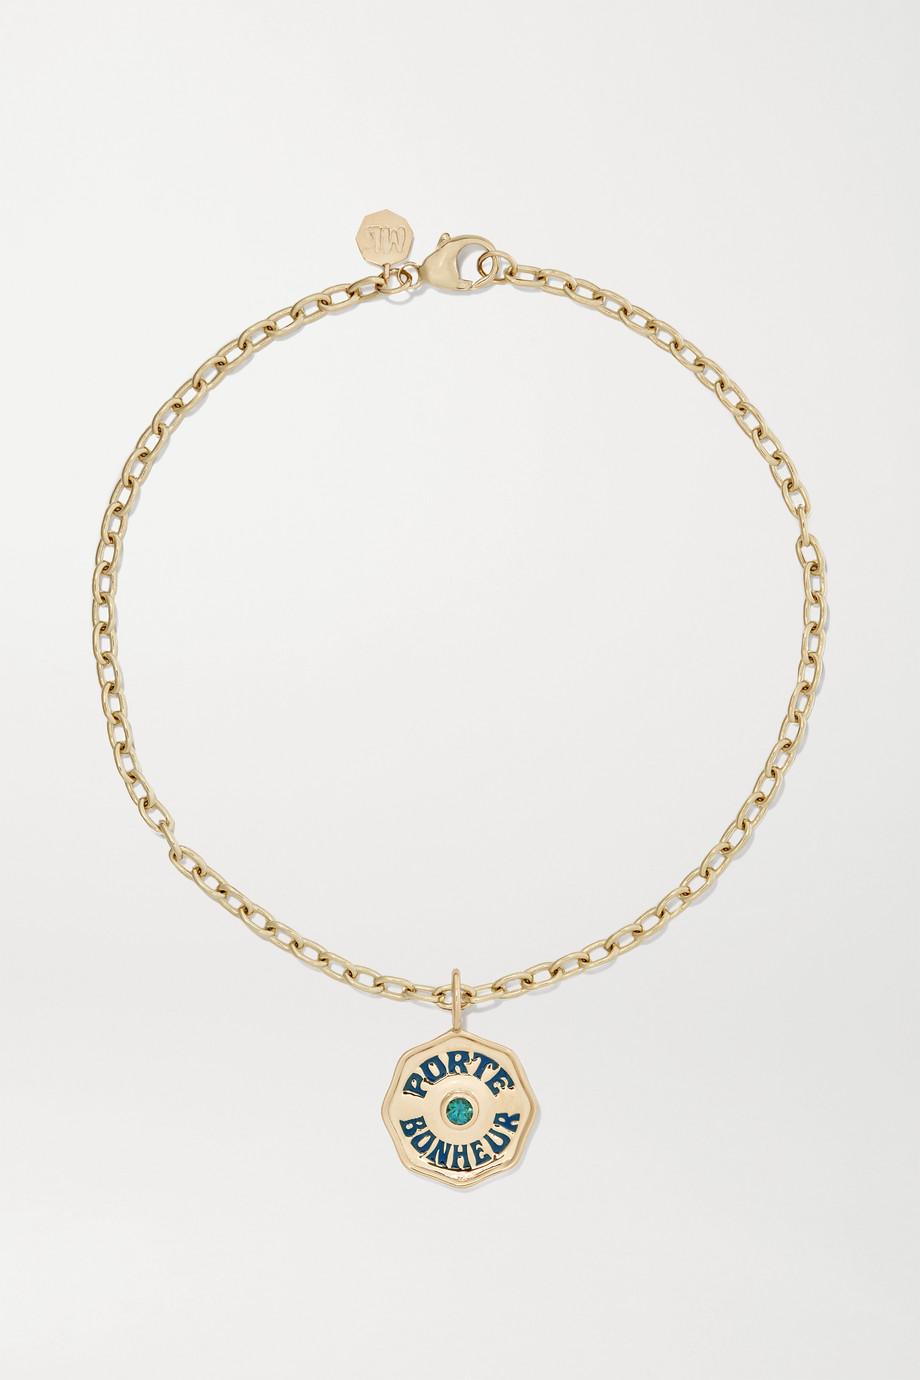 Marlo Laz Mini Porte Bonheur Coin 14-karat gold, enamel and alexandrite anklet